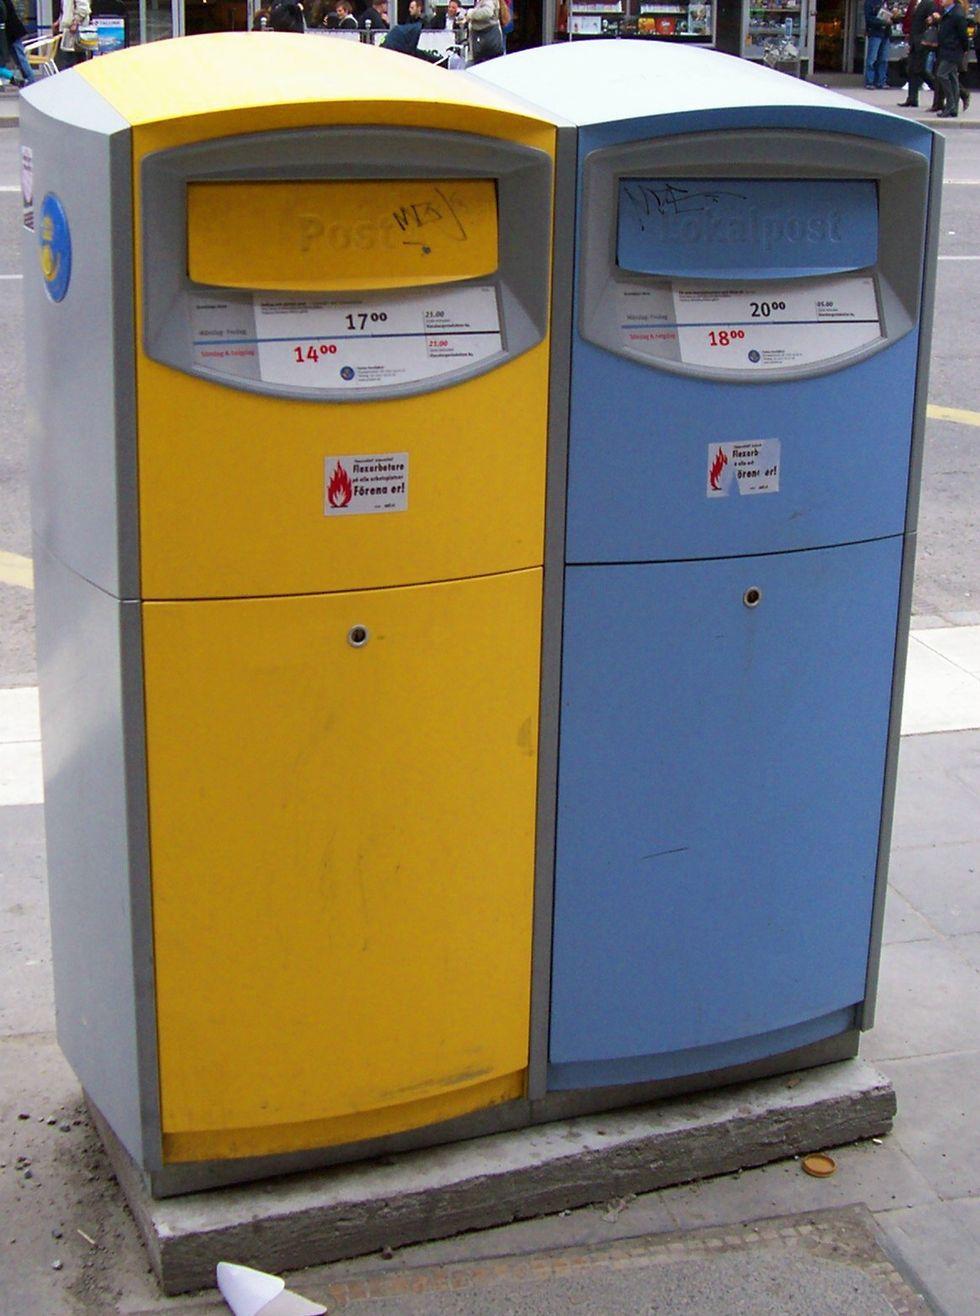 töms postlådor på söndagar